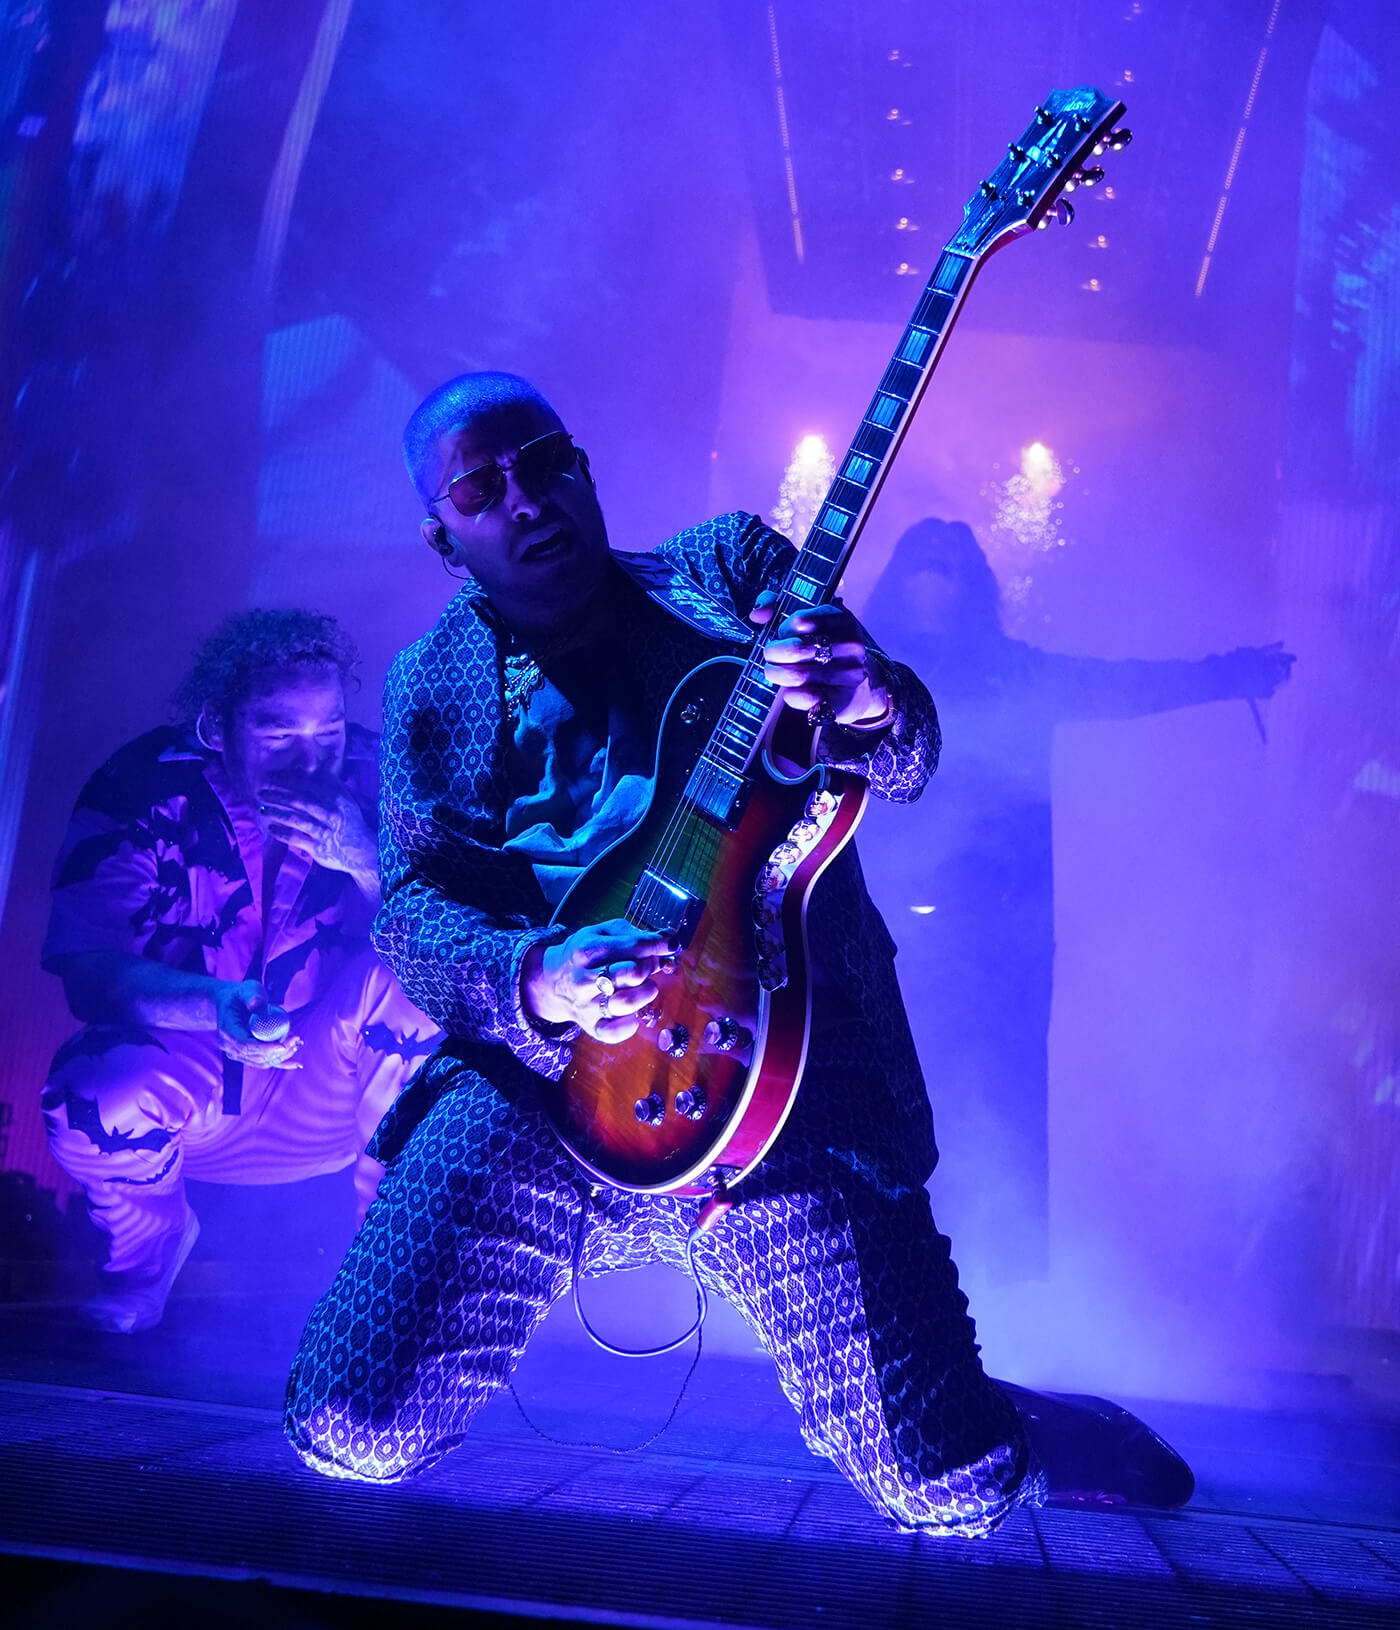 Andrew Watt, Ozzy Osbourne and Post Malone